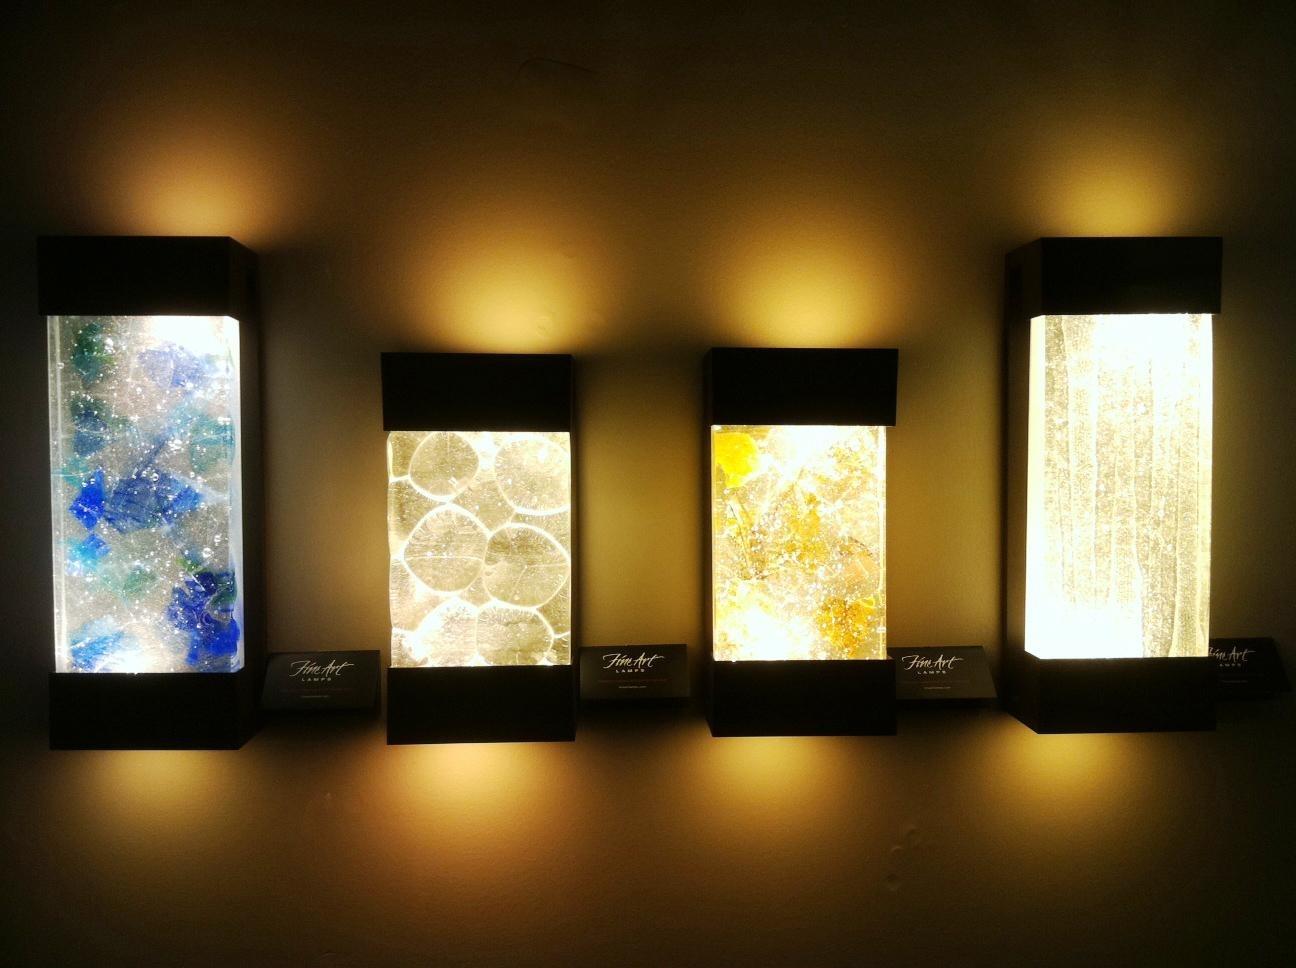 Modern Outdoor Wall Lighting — The Mebrureoral Design : Design Of Regarding Outdoor Wall Led Lighting Fixtures (#6 of 15)